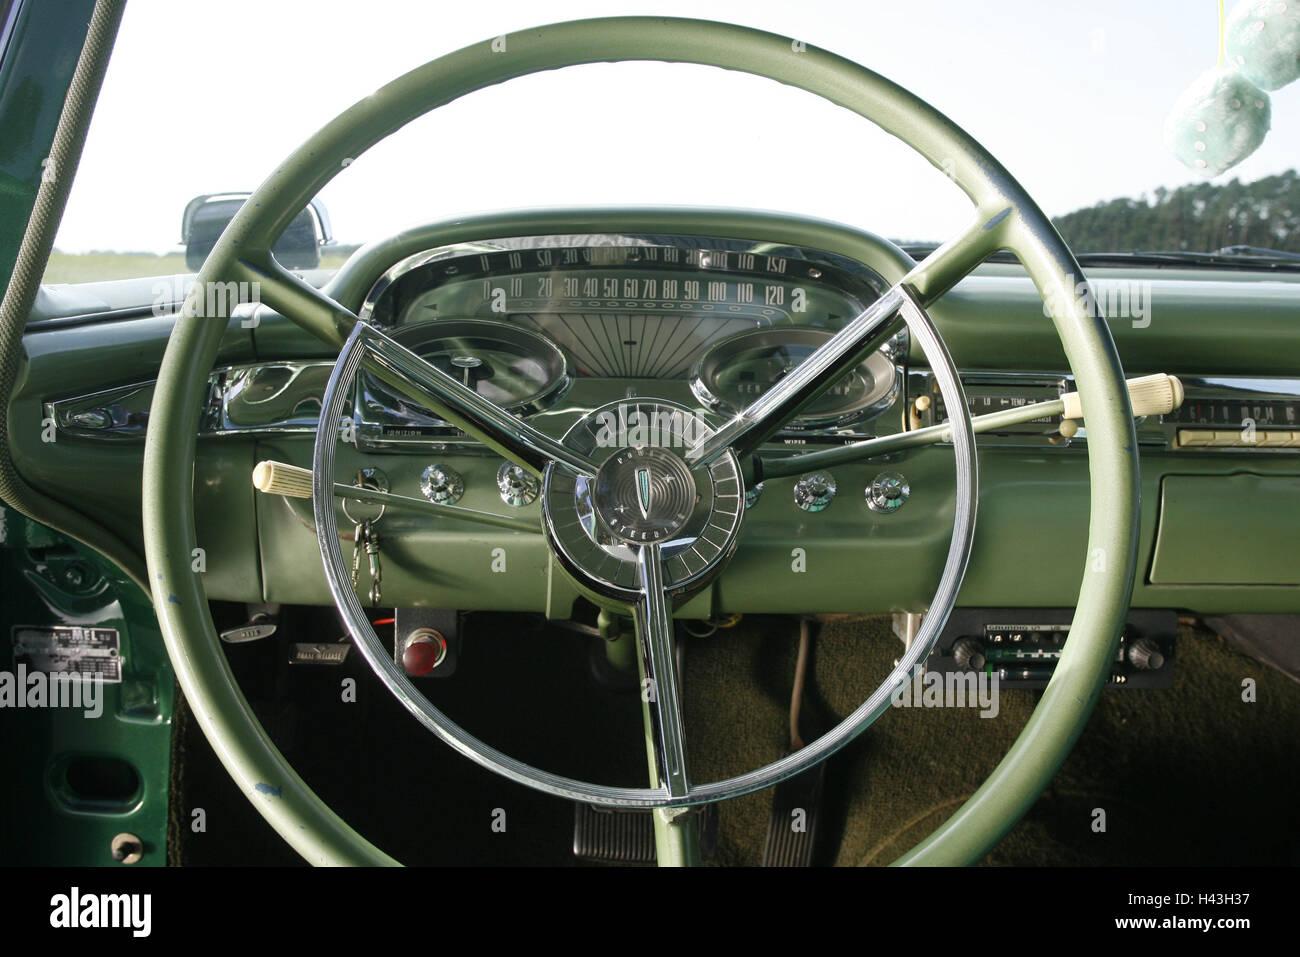 Auto cockpit erklärung  Armaturenbrett Symbole | ambiznes.com